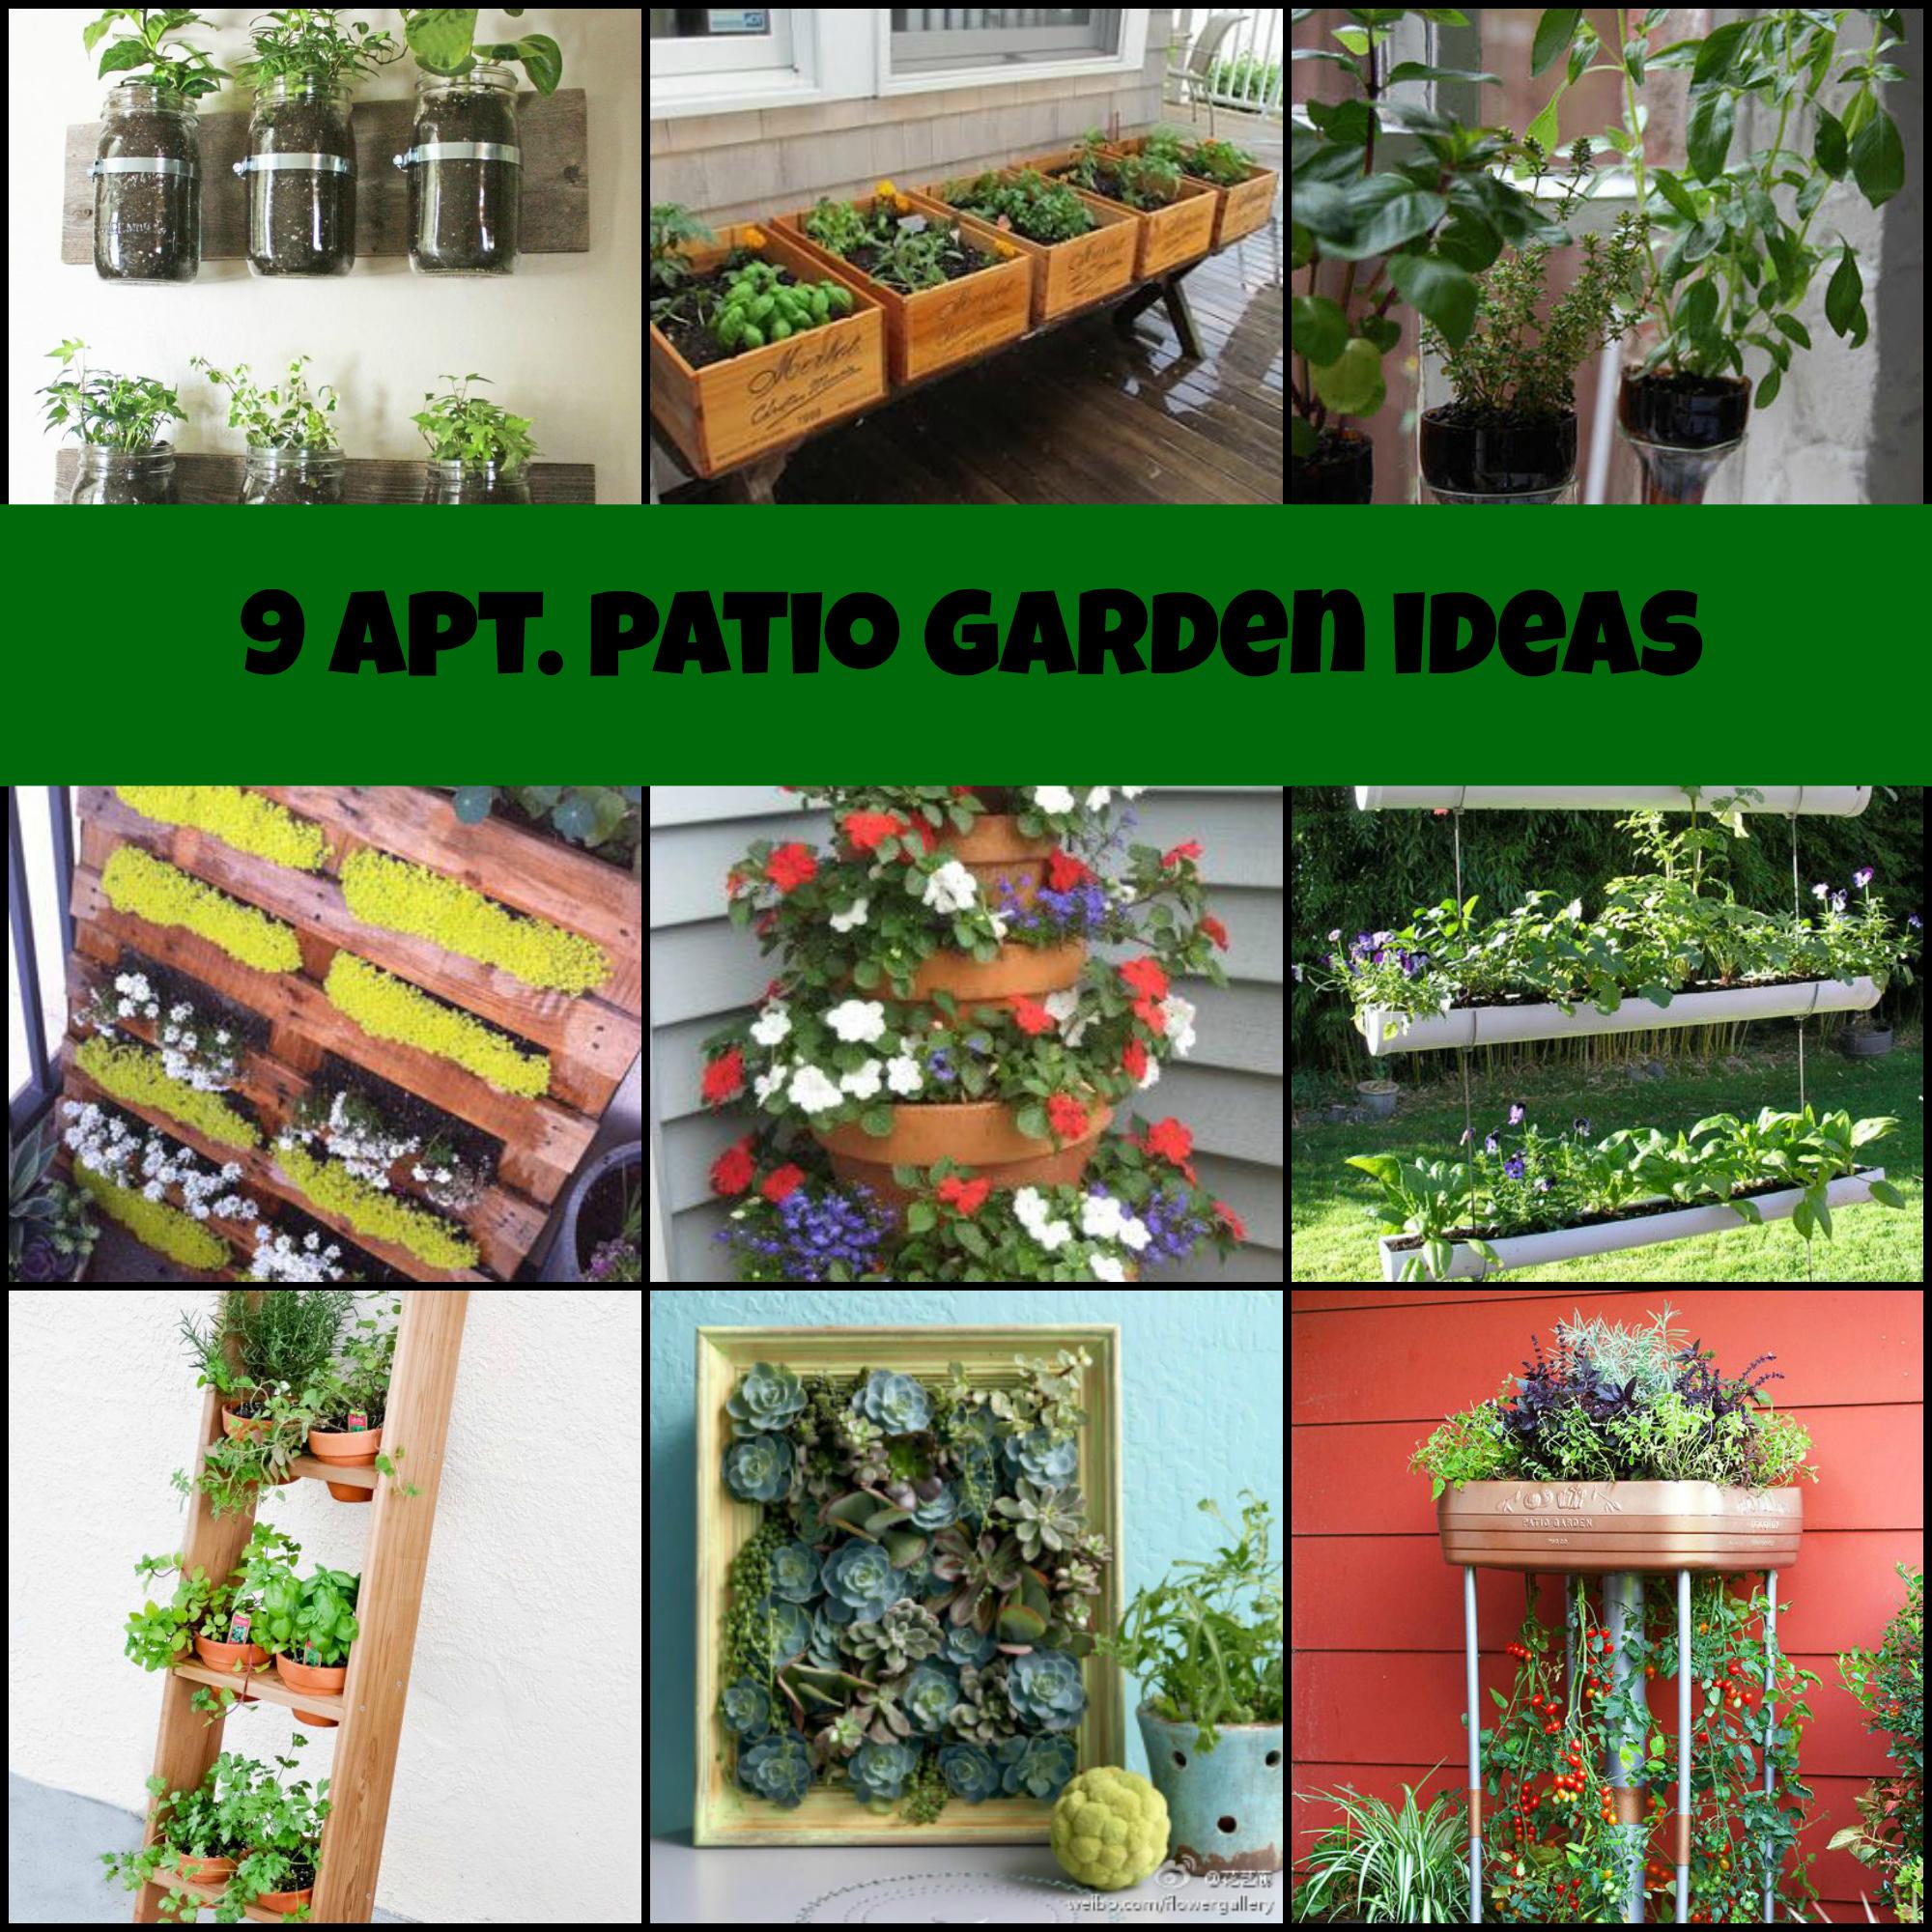 17 Best 1000 images about Garden ideas on Pinterest Gardens Fake